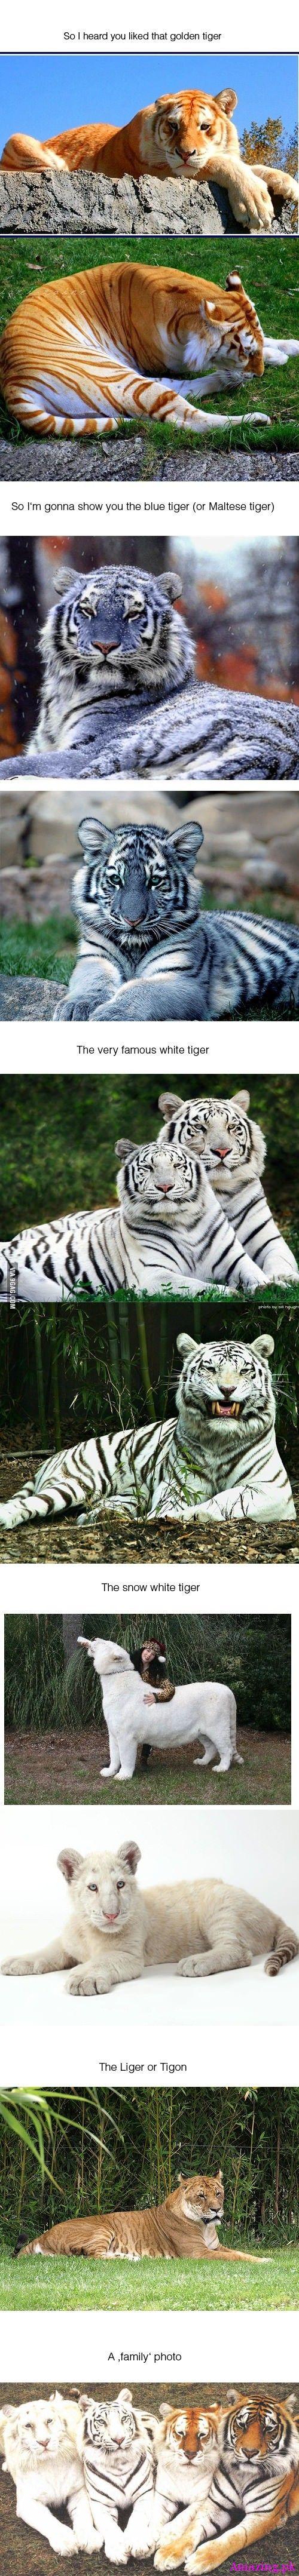 So I Heard You Liked That Golden Tiger #Amazing #Animals Amazing.pk